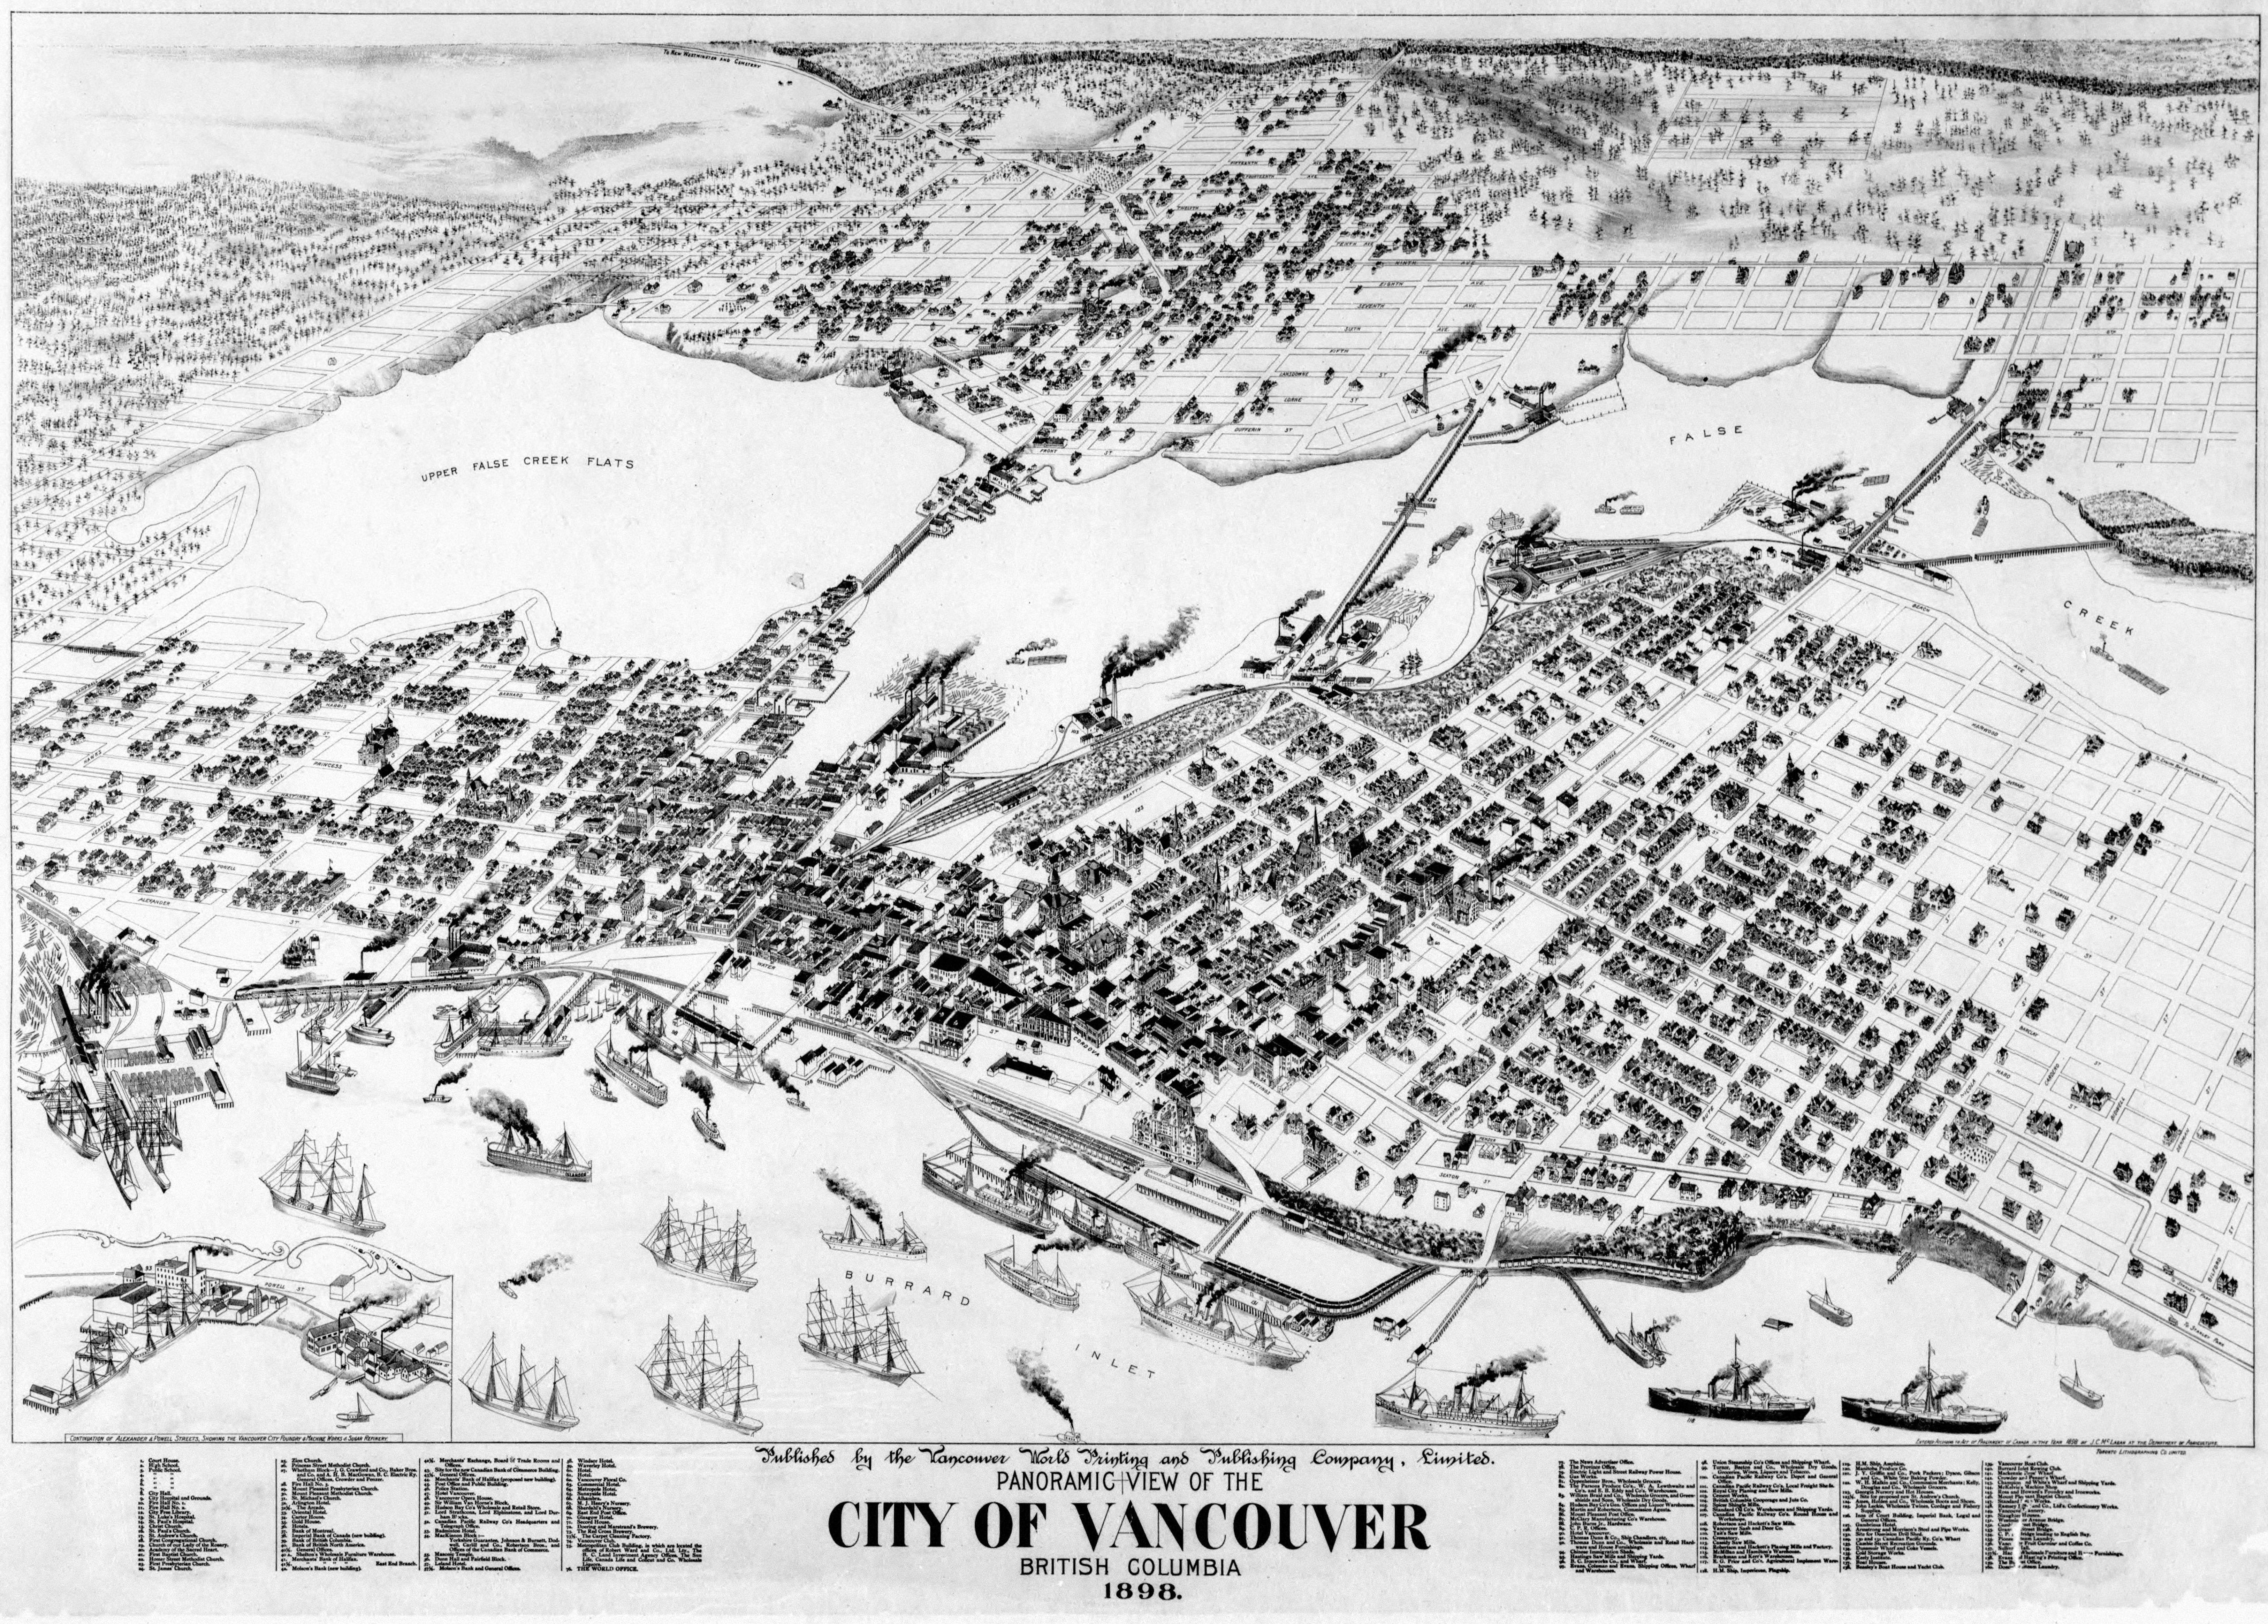 vancouver british columbia canada 1898 maps